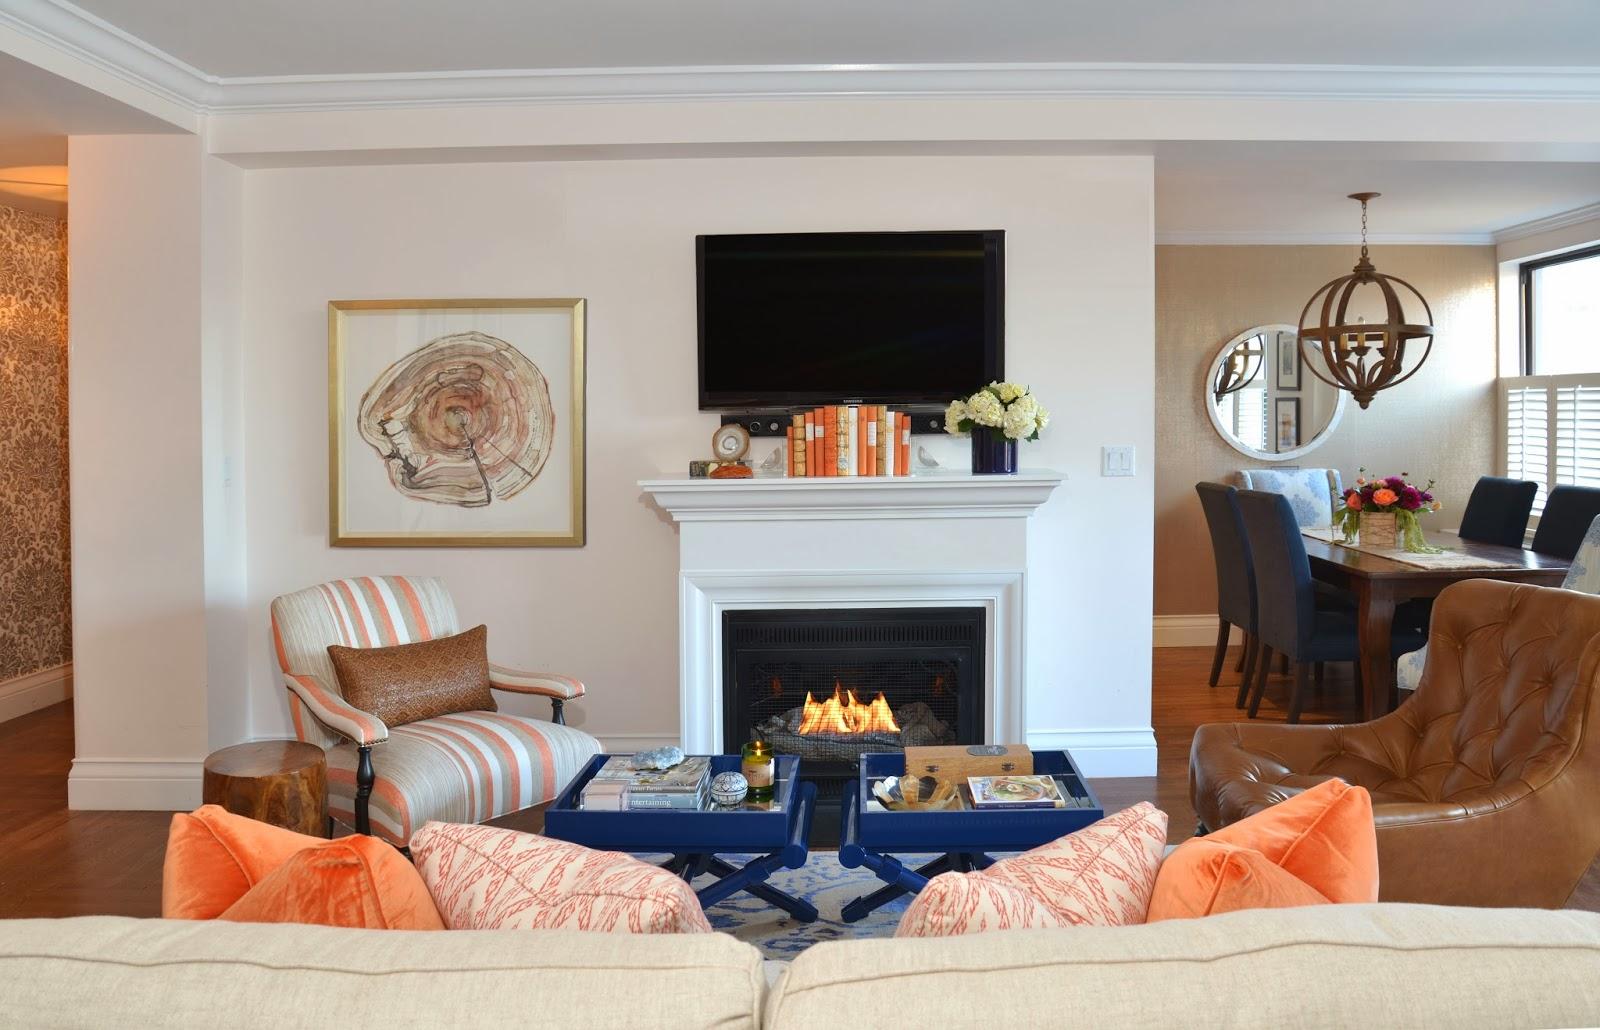 Dalliance design a love affair with design portfolio for Upper west side apartment